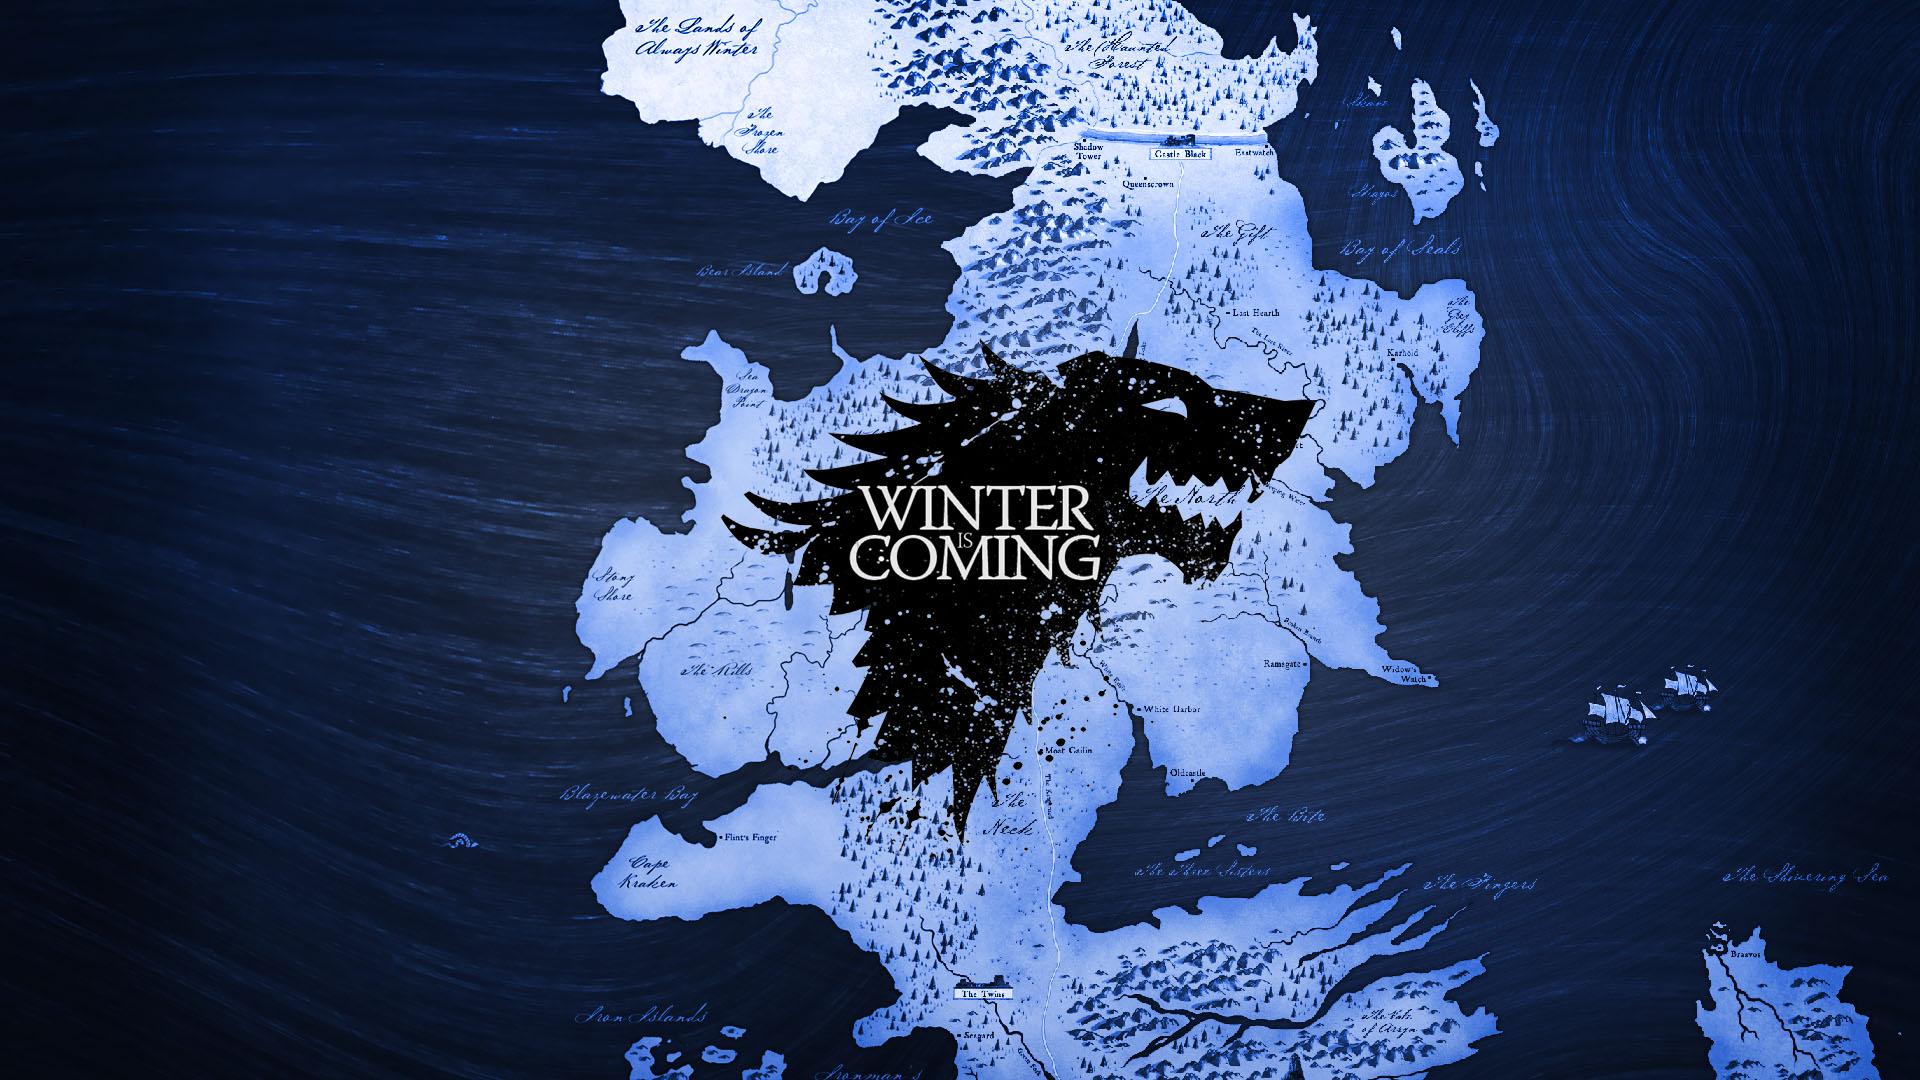 Game Of Thrones Episodio 1-3 Ing-Sub esp lat Mega - Mega Descargas